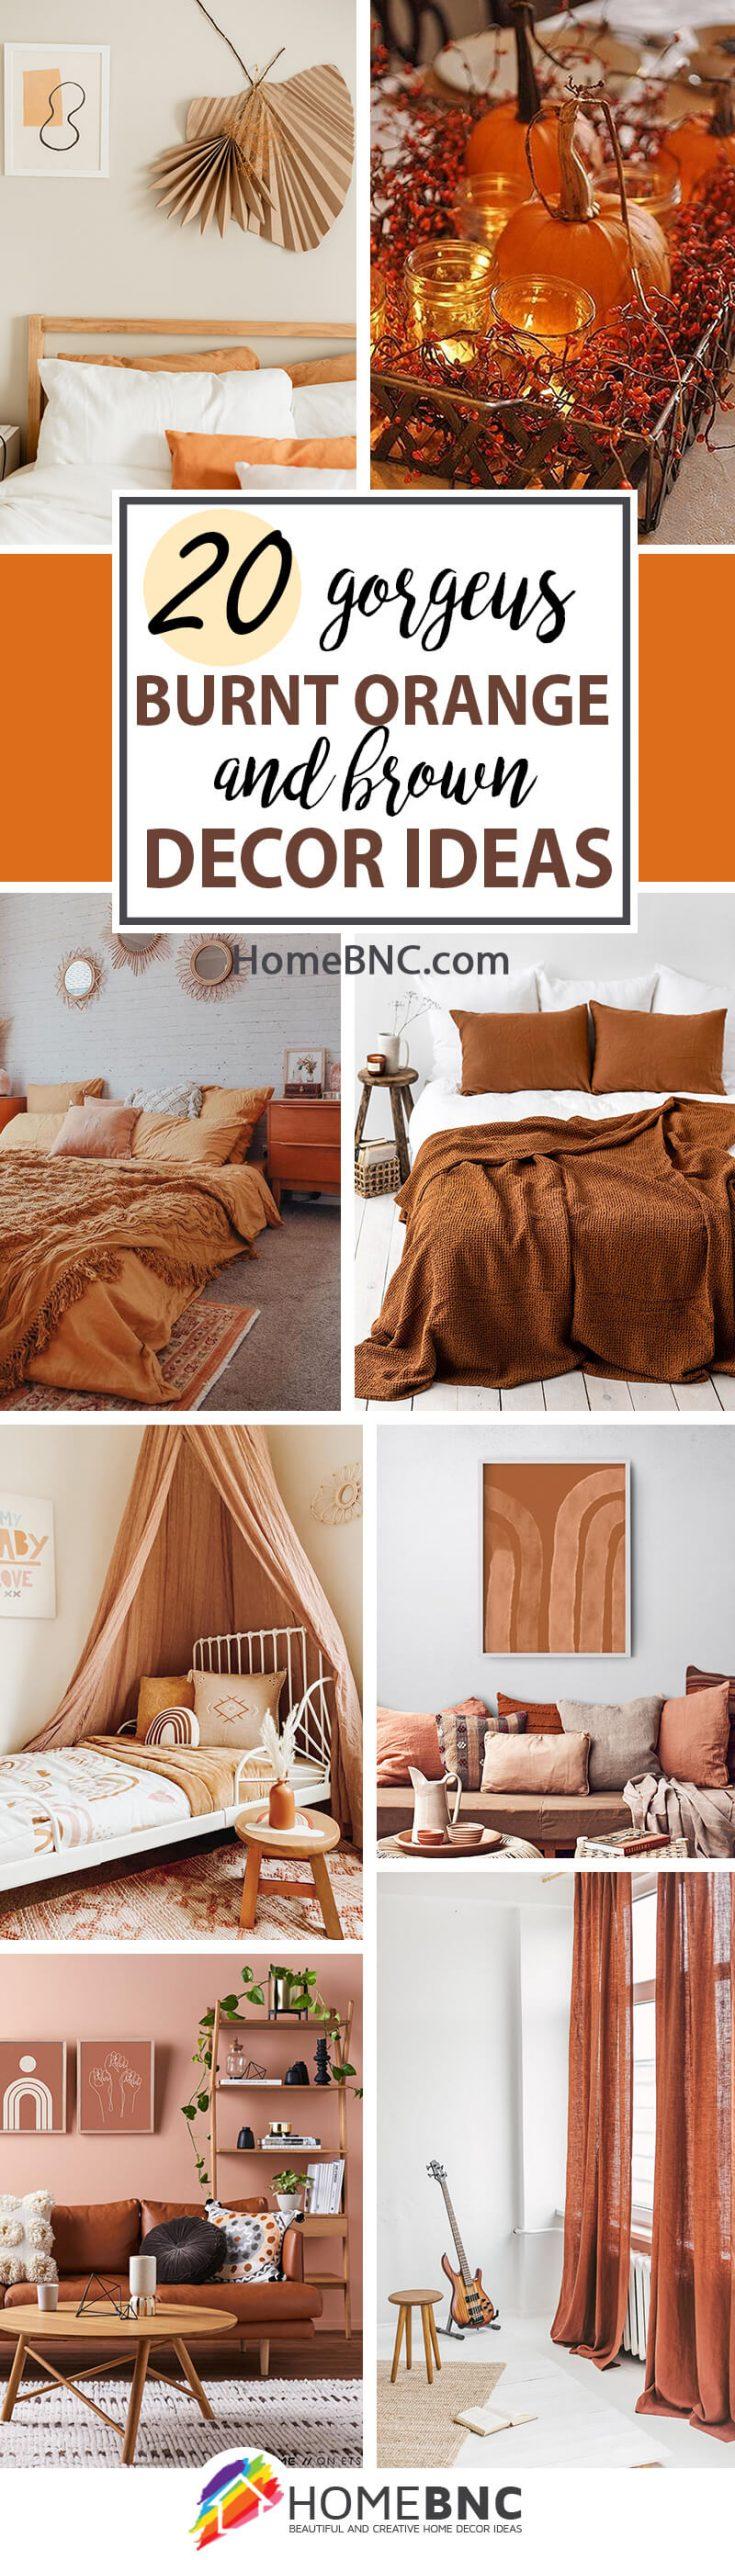 Best Burnt Orange and Brown Home Decor Ideas